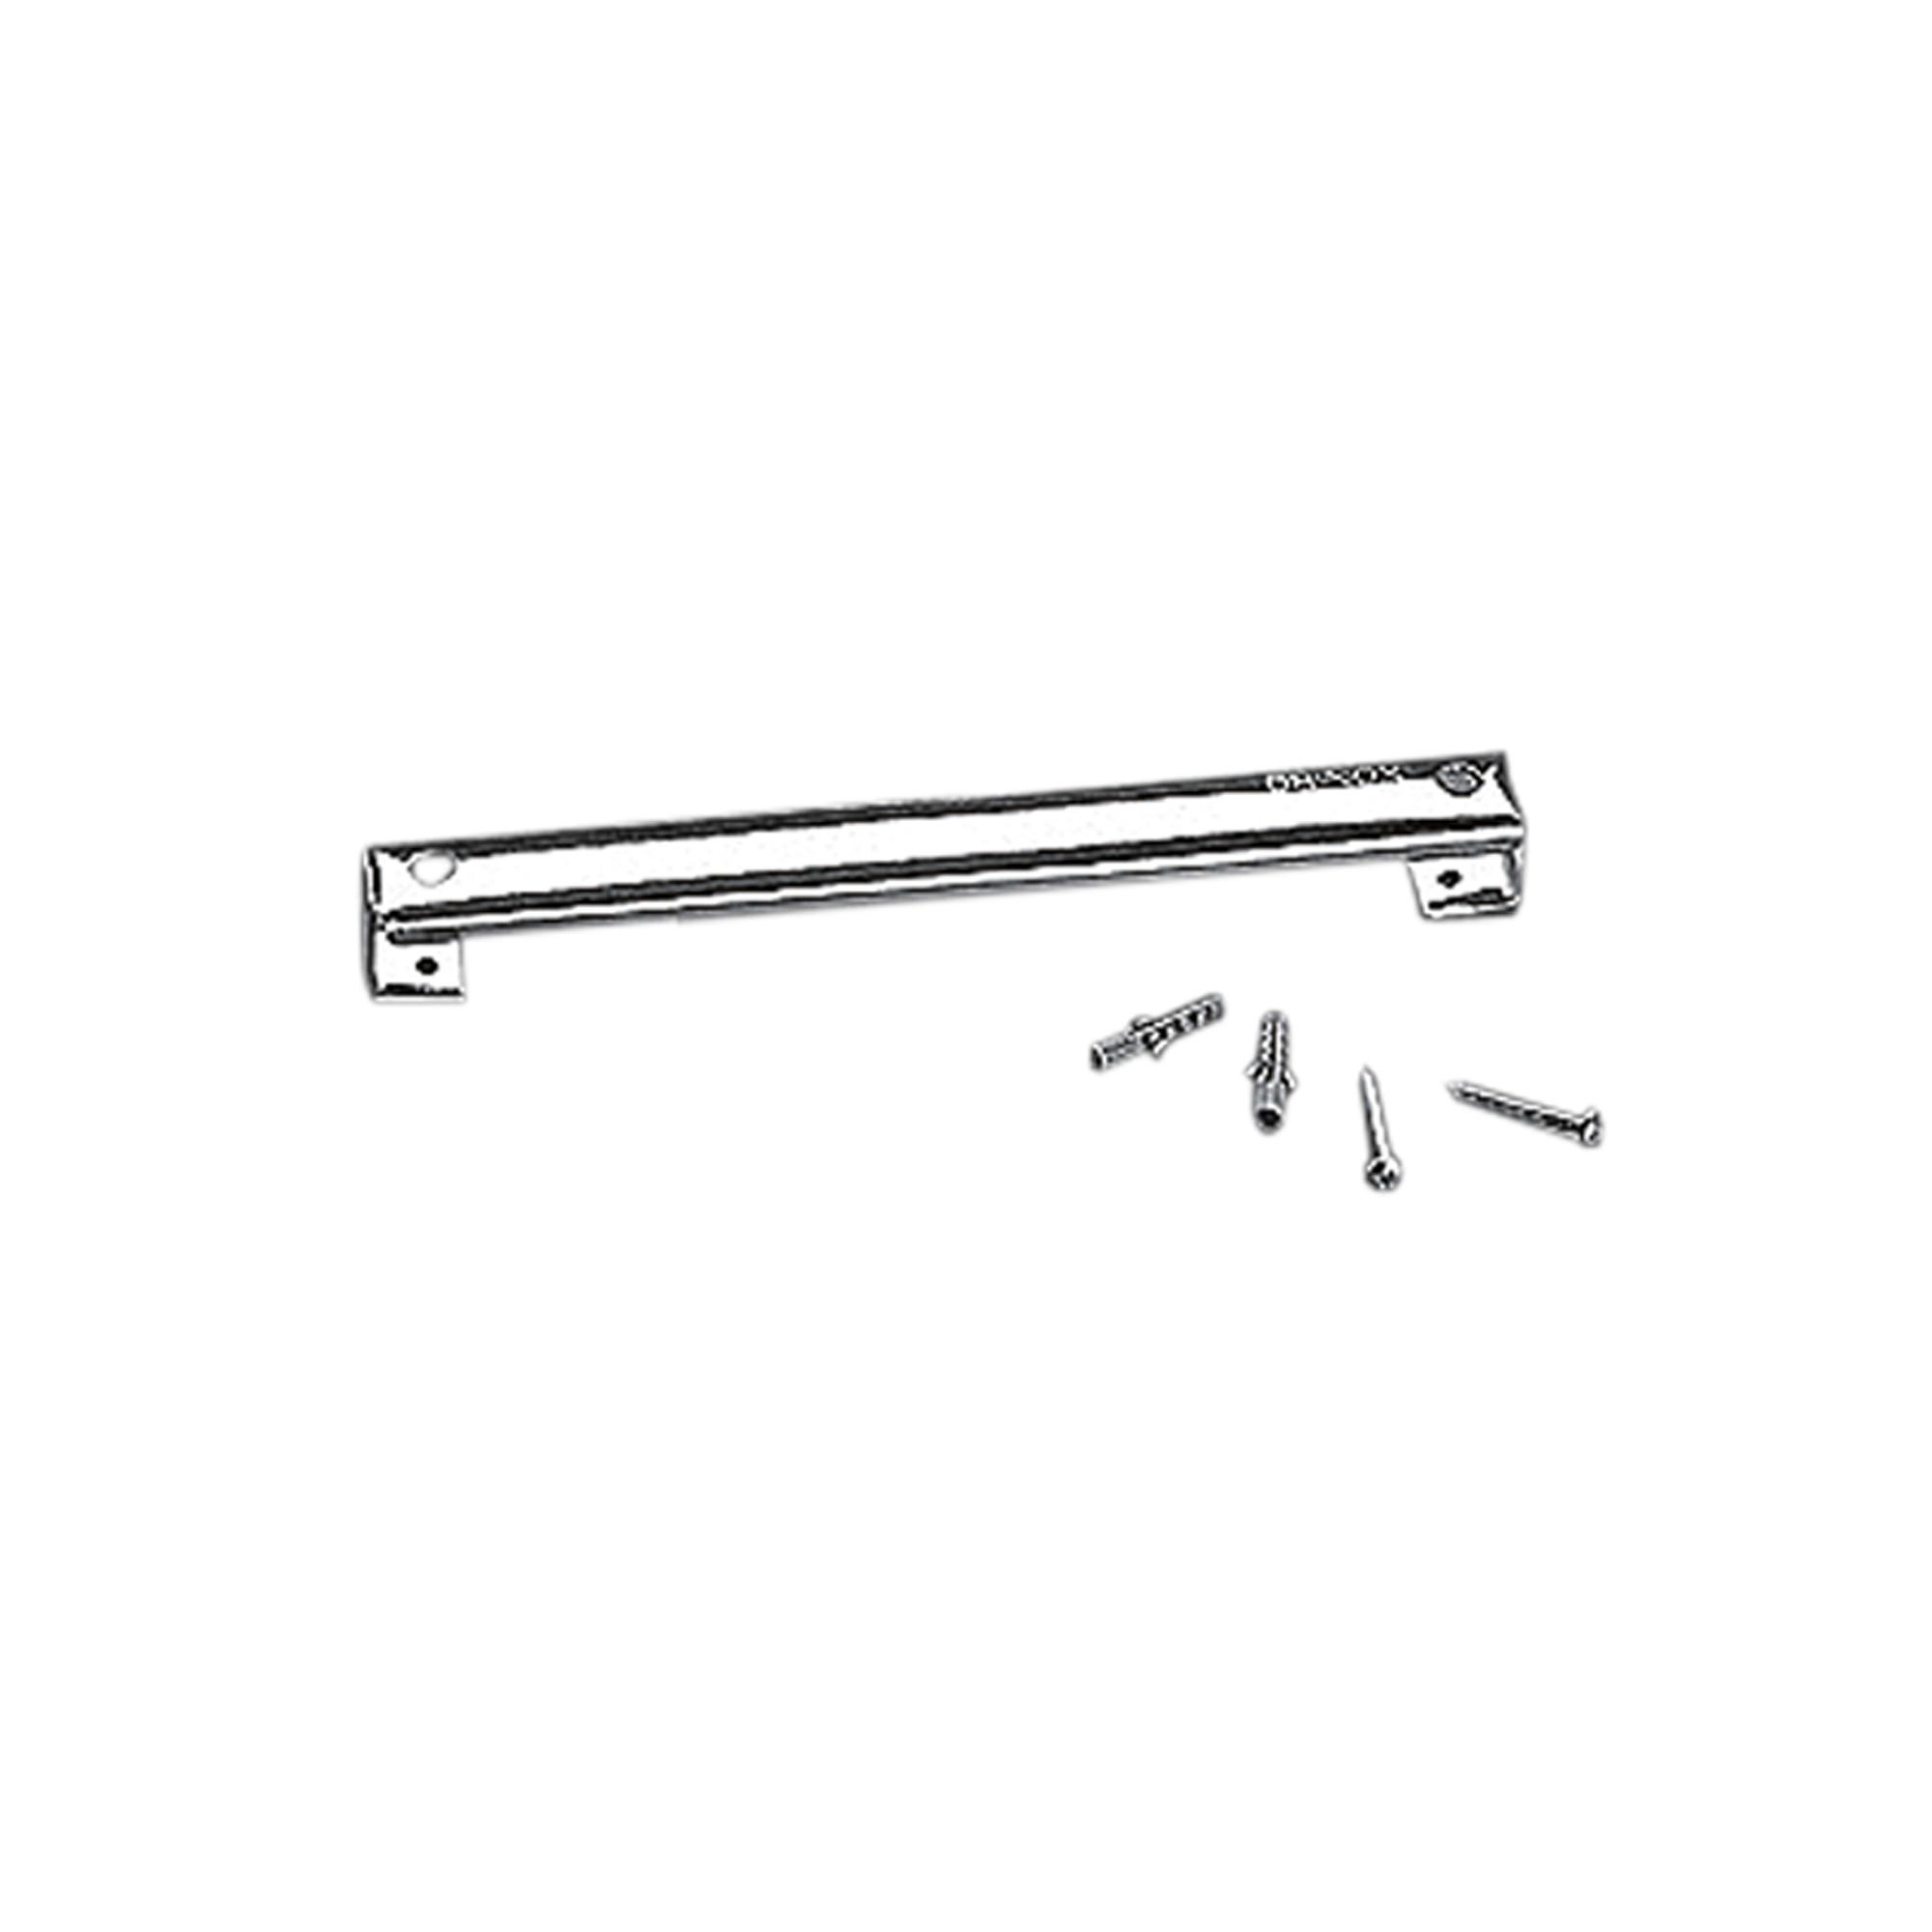 Barra para Utensilios Inox 25cm - Brinox